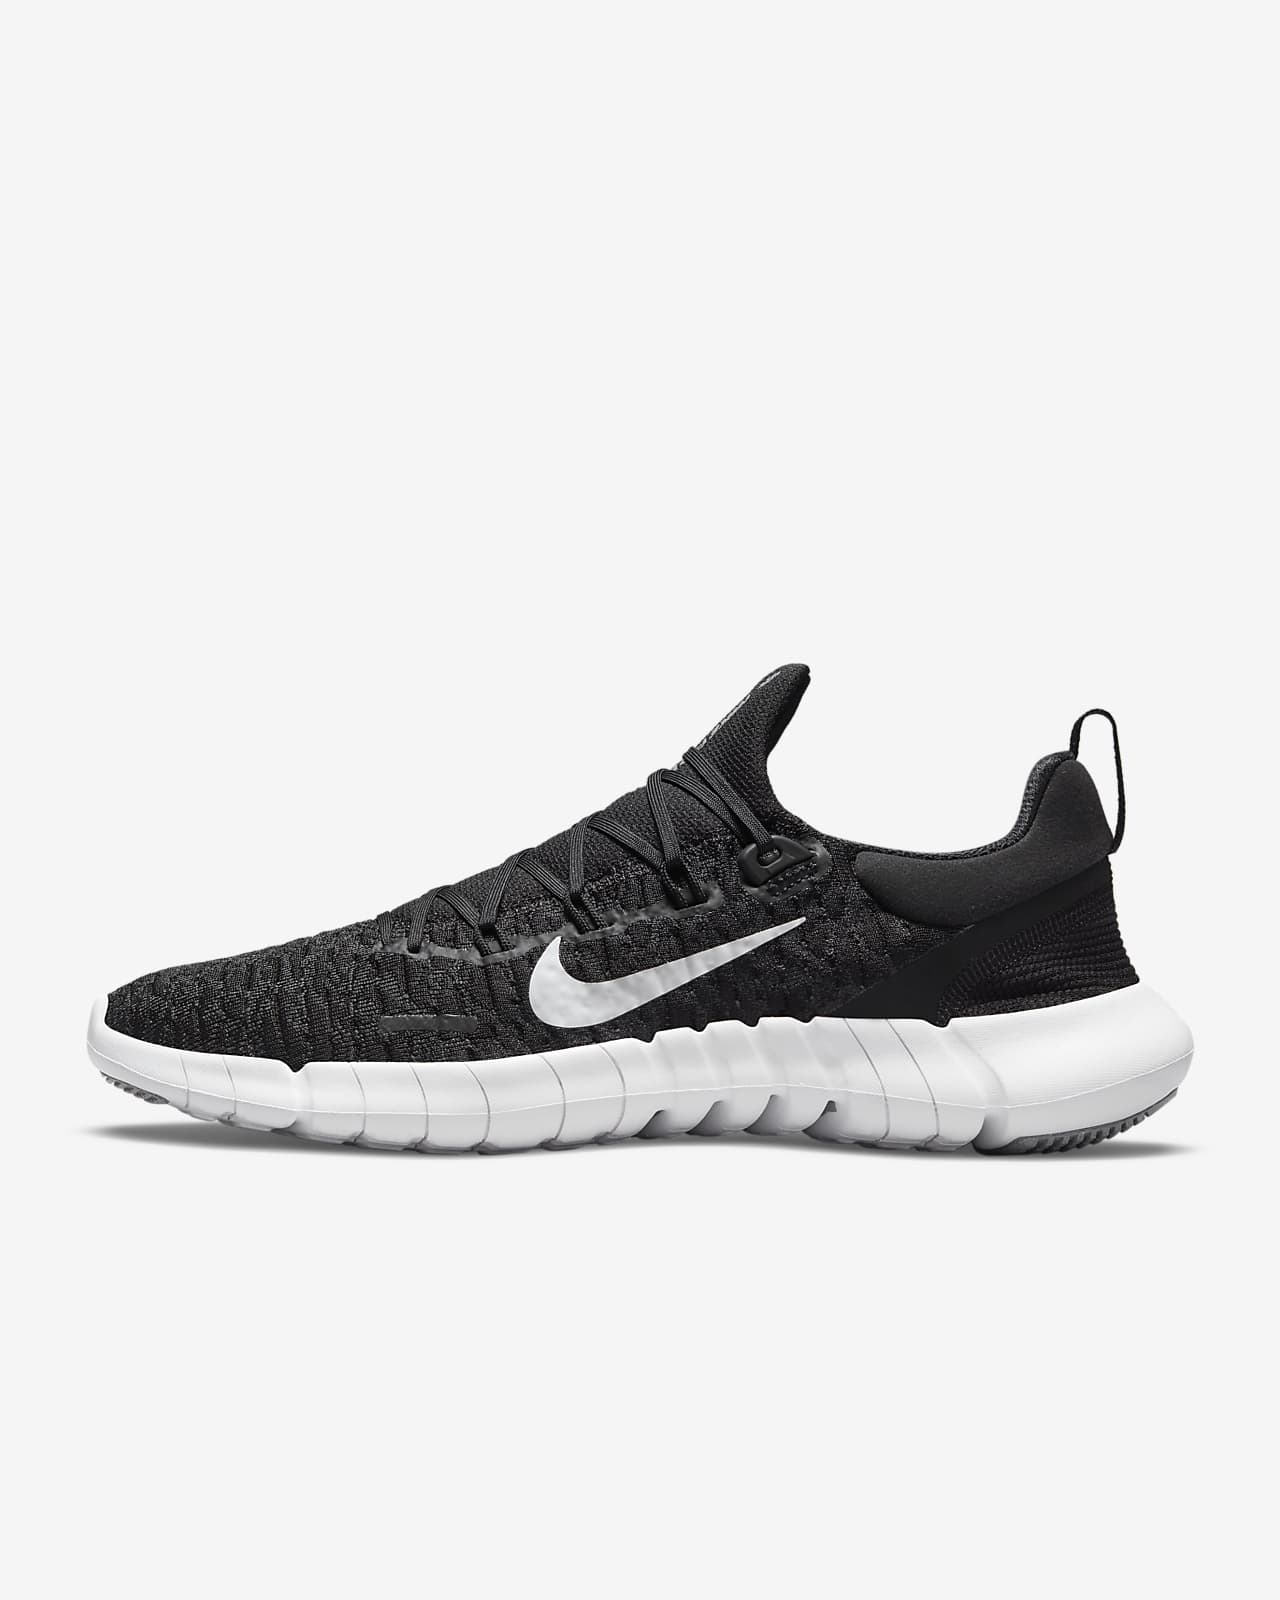 Calzado de running para mujer Nike Free Run 5.0